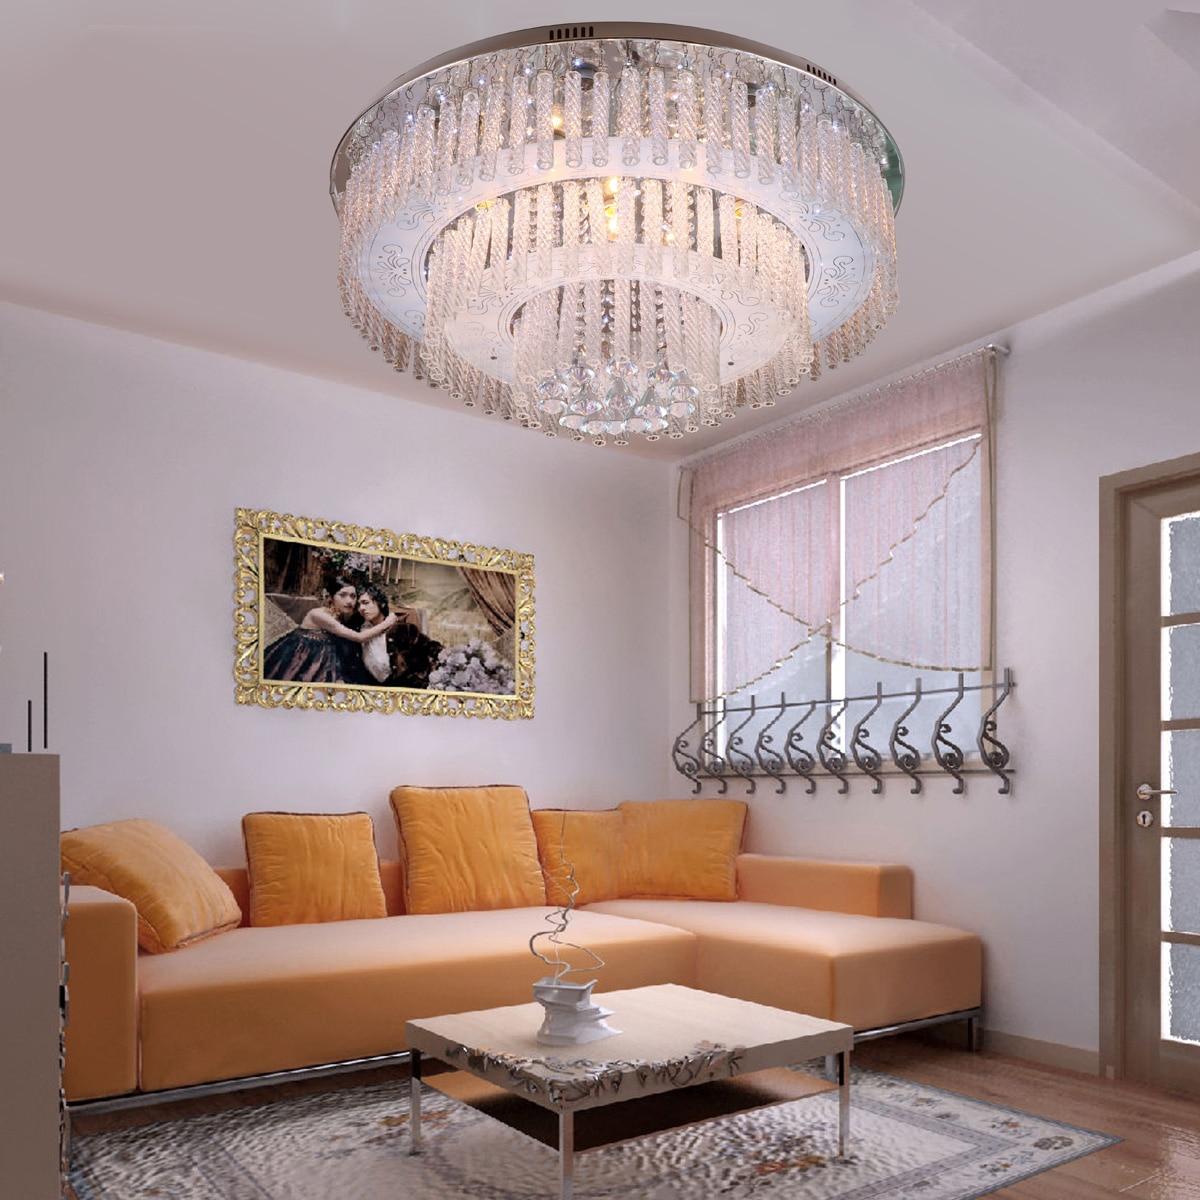 Modern Brief Cake Type Crystal Ceiling Light Living Room